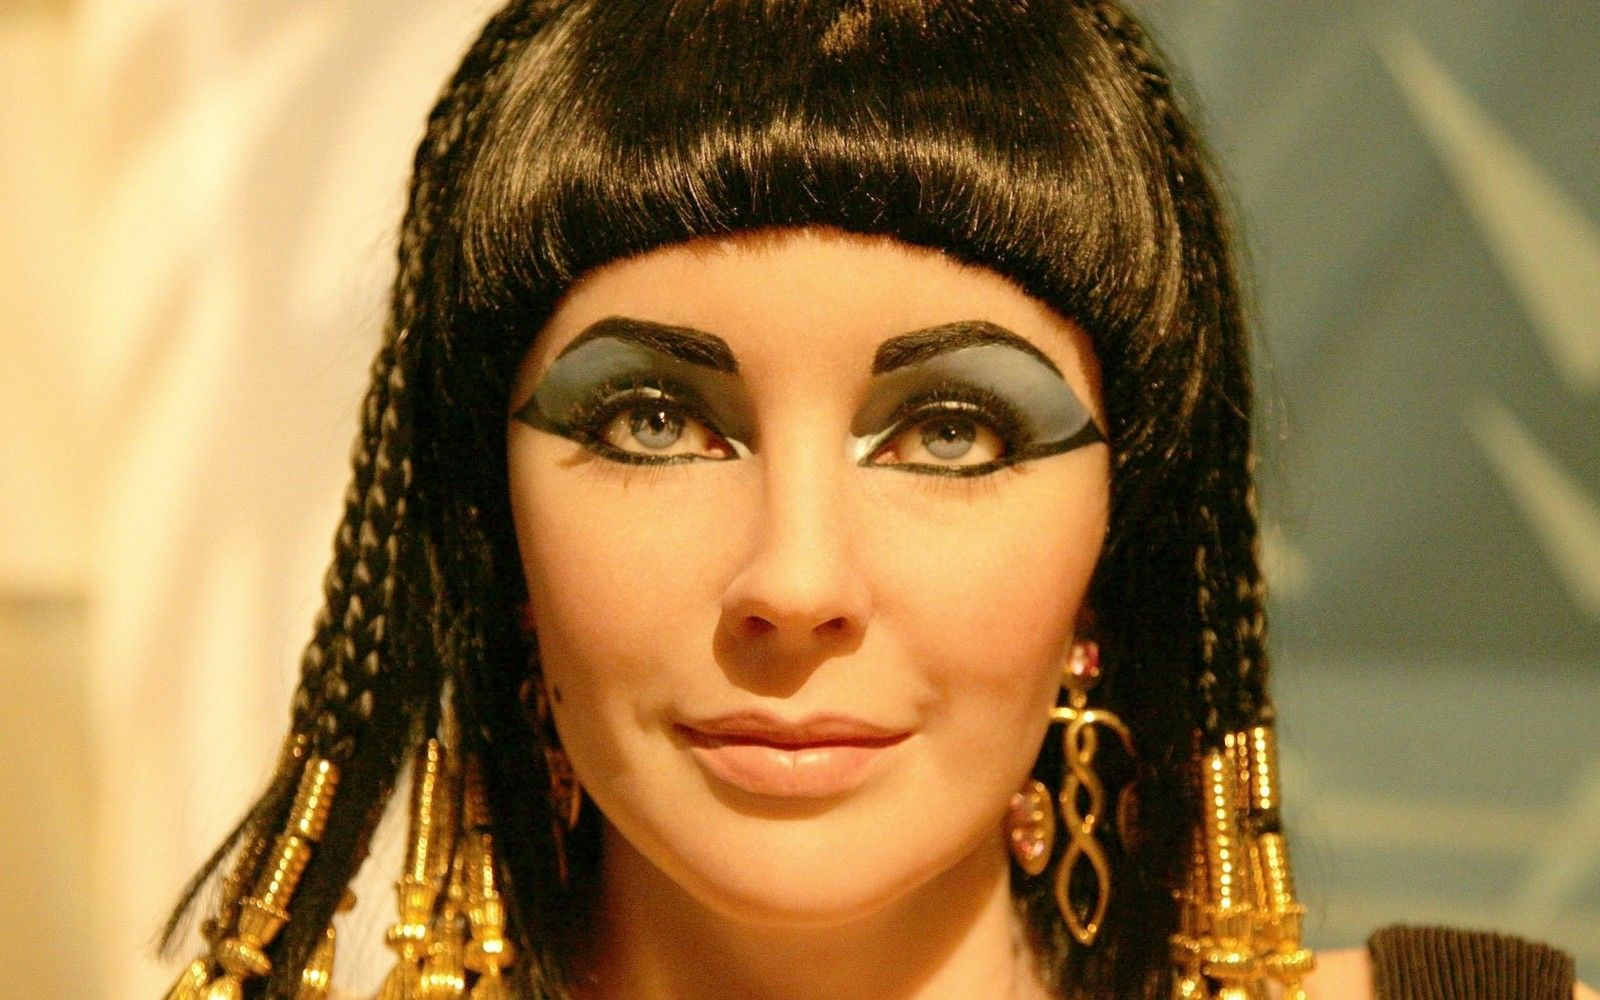 H D Picture Of Queen Cleopatra: Stephen Boyd Talks About Elizabeth Taylor, Richard Burton